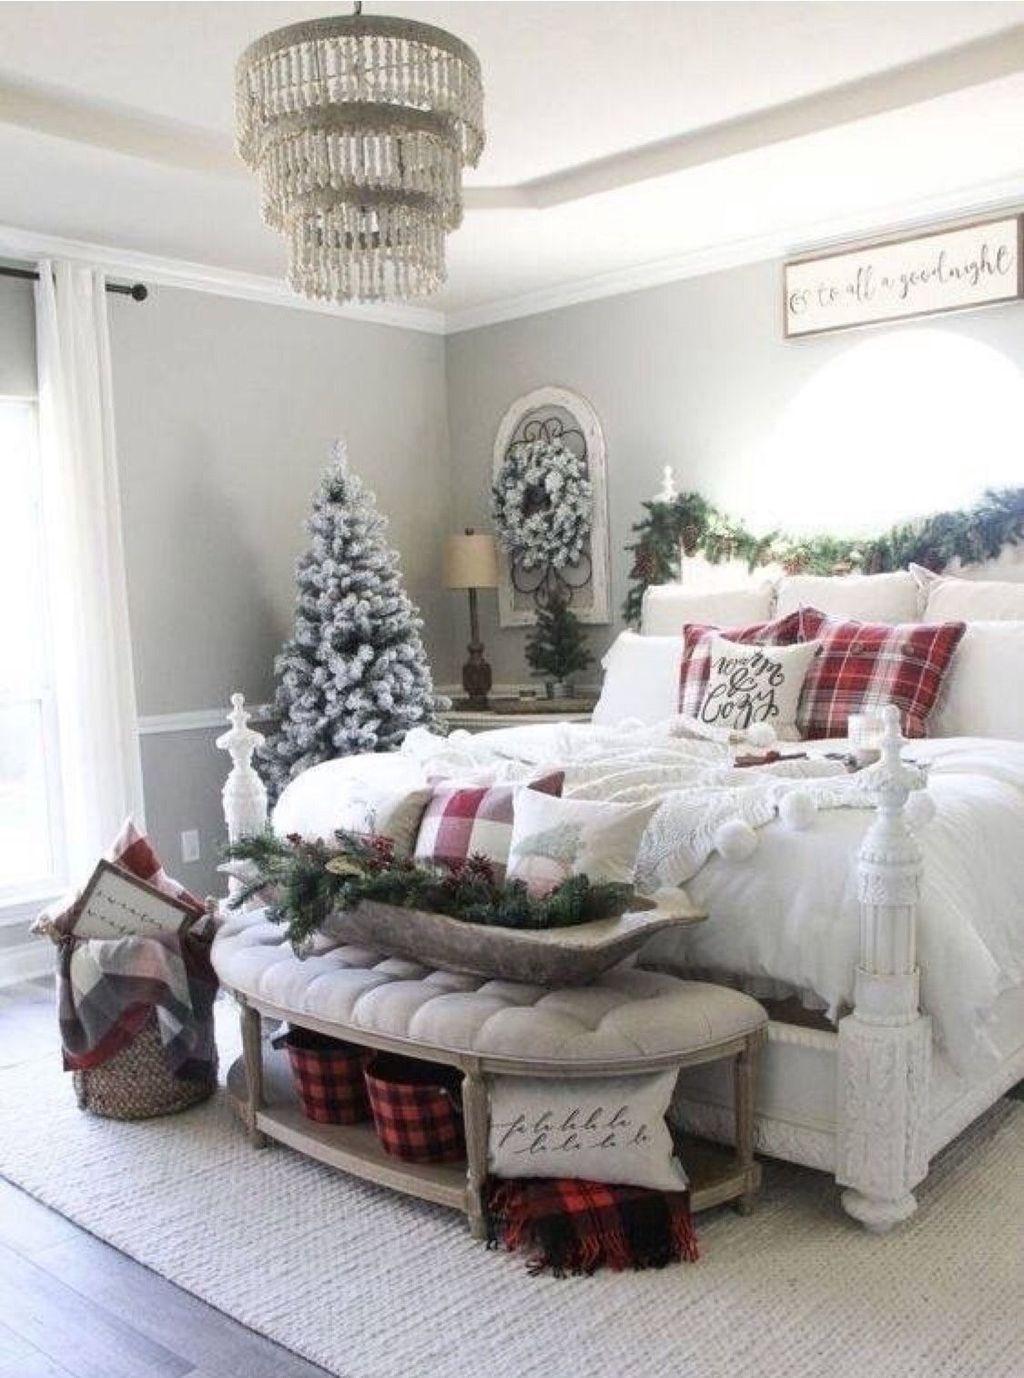 40 Lovely Winter Wonderland Home Decoration Ideas Look Beautiful Pimphomee Christmas Apartment Christmas Decorations Bedroom Pretty Christmas Decorations